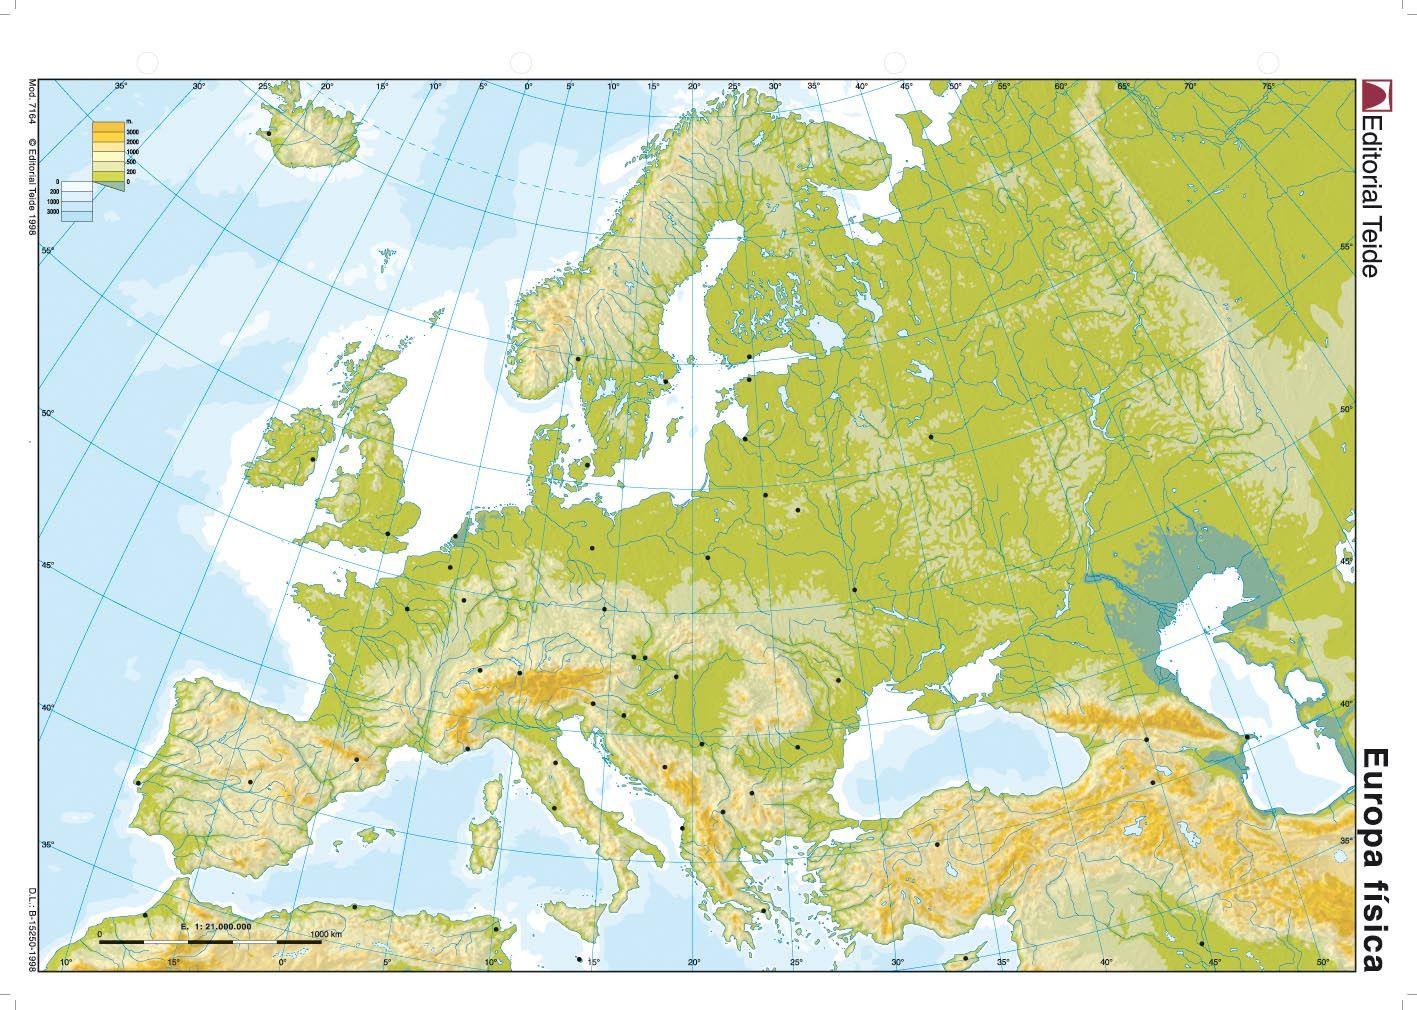 Europa Mapa Fisico Mudo.Resultado De Imagen De Europa Mapa Fisico Mudo Biologia